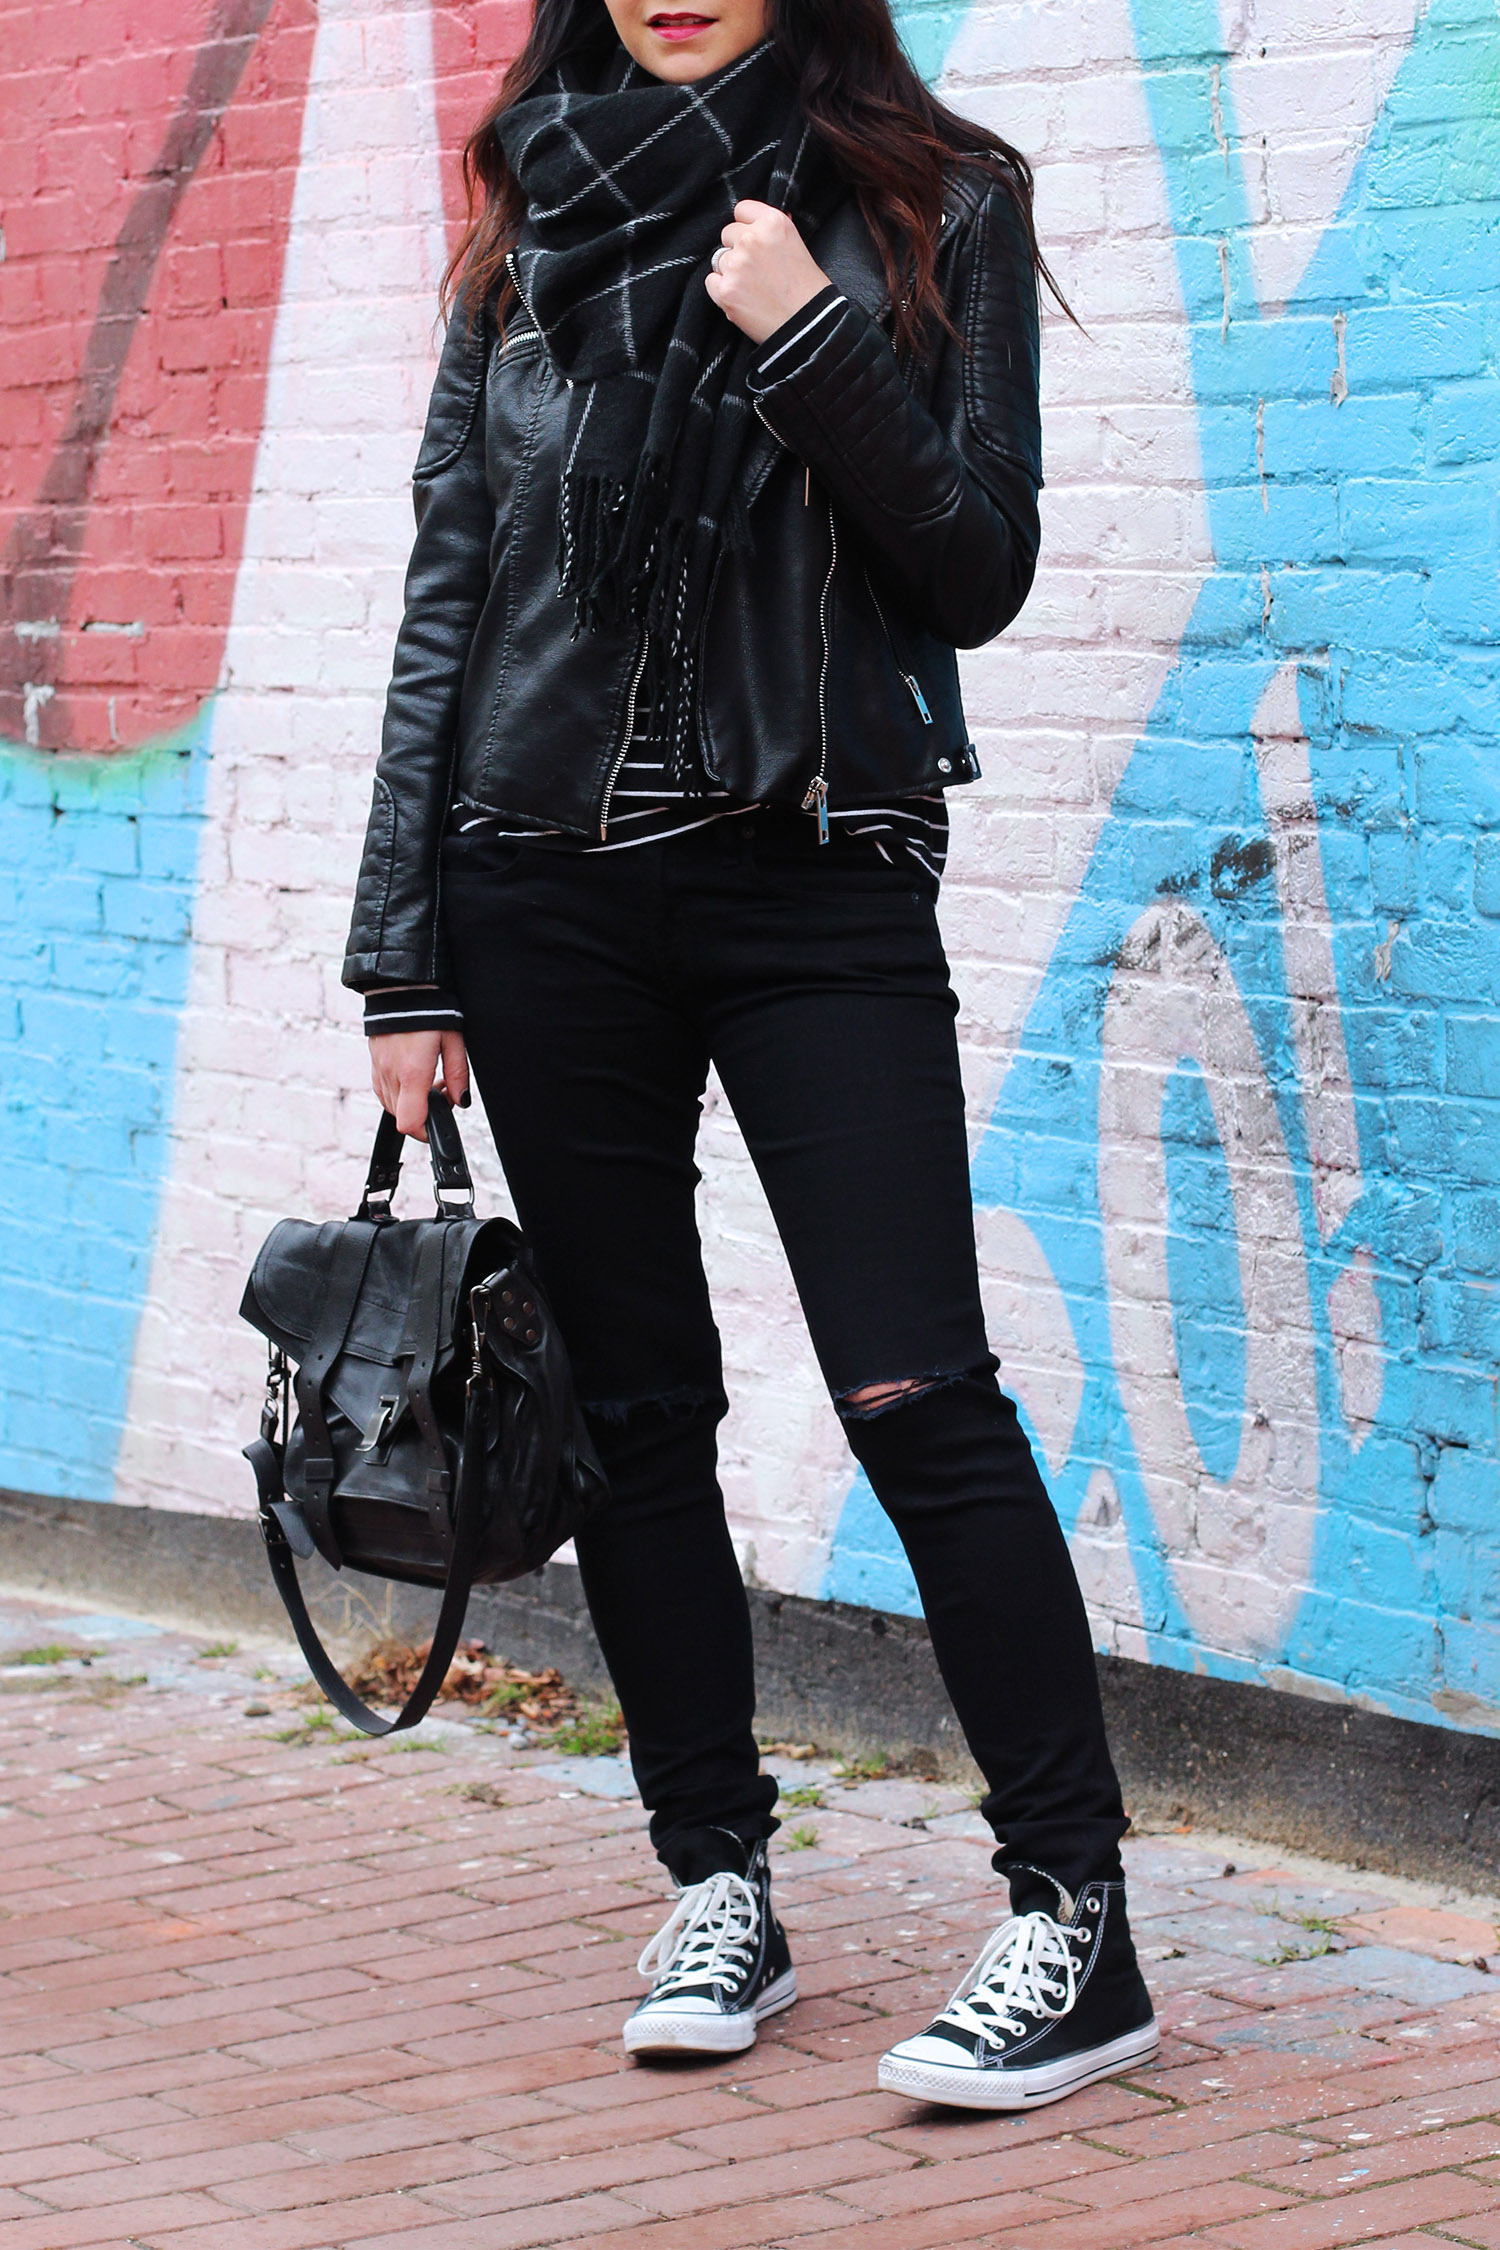 Converse, Ripped Jeans, Zara Jacket